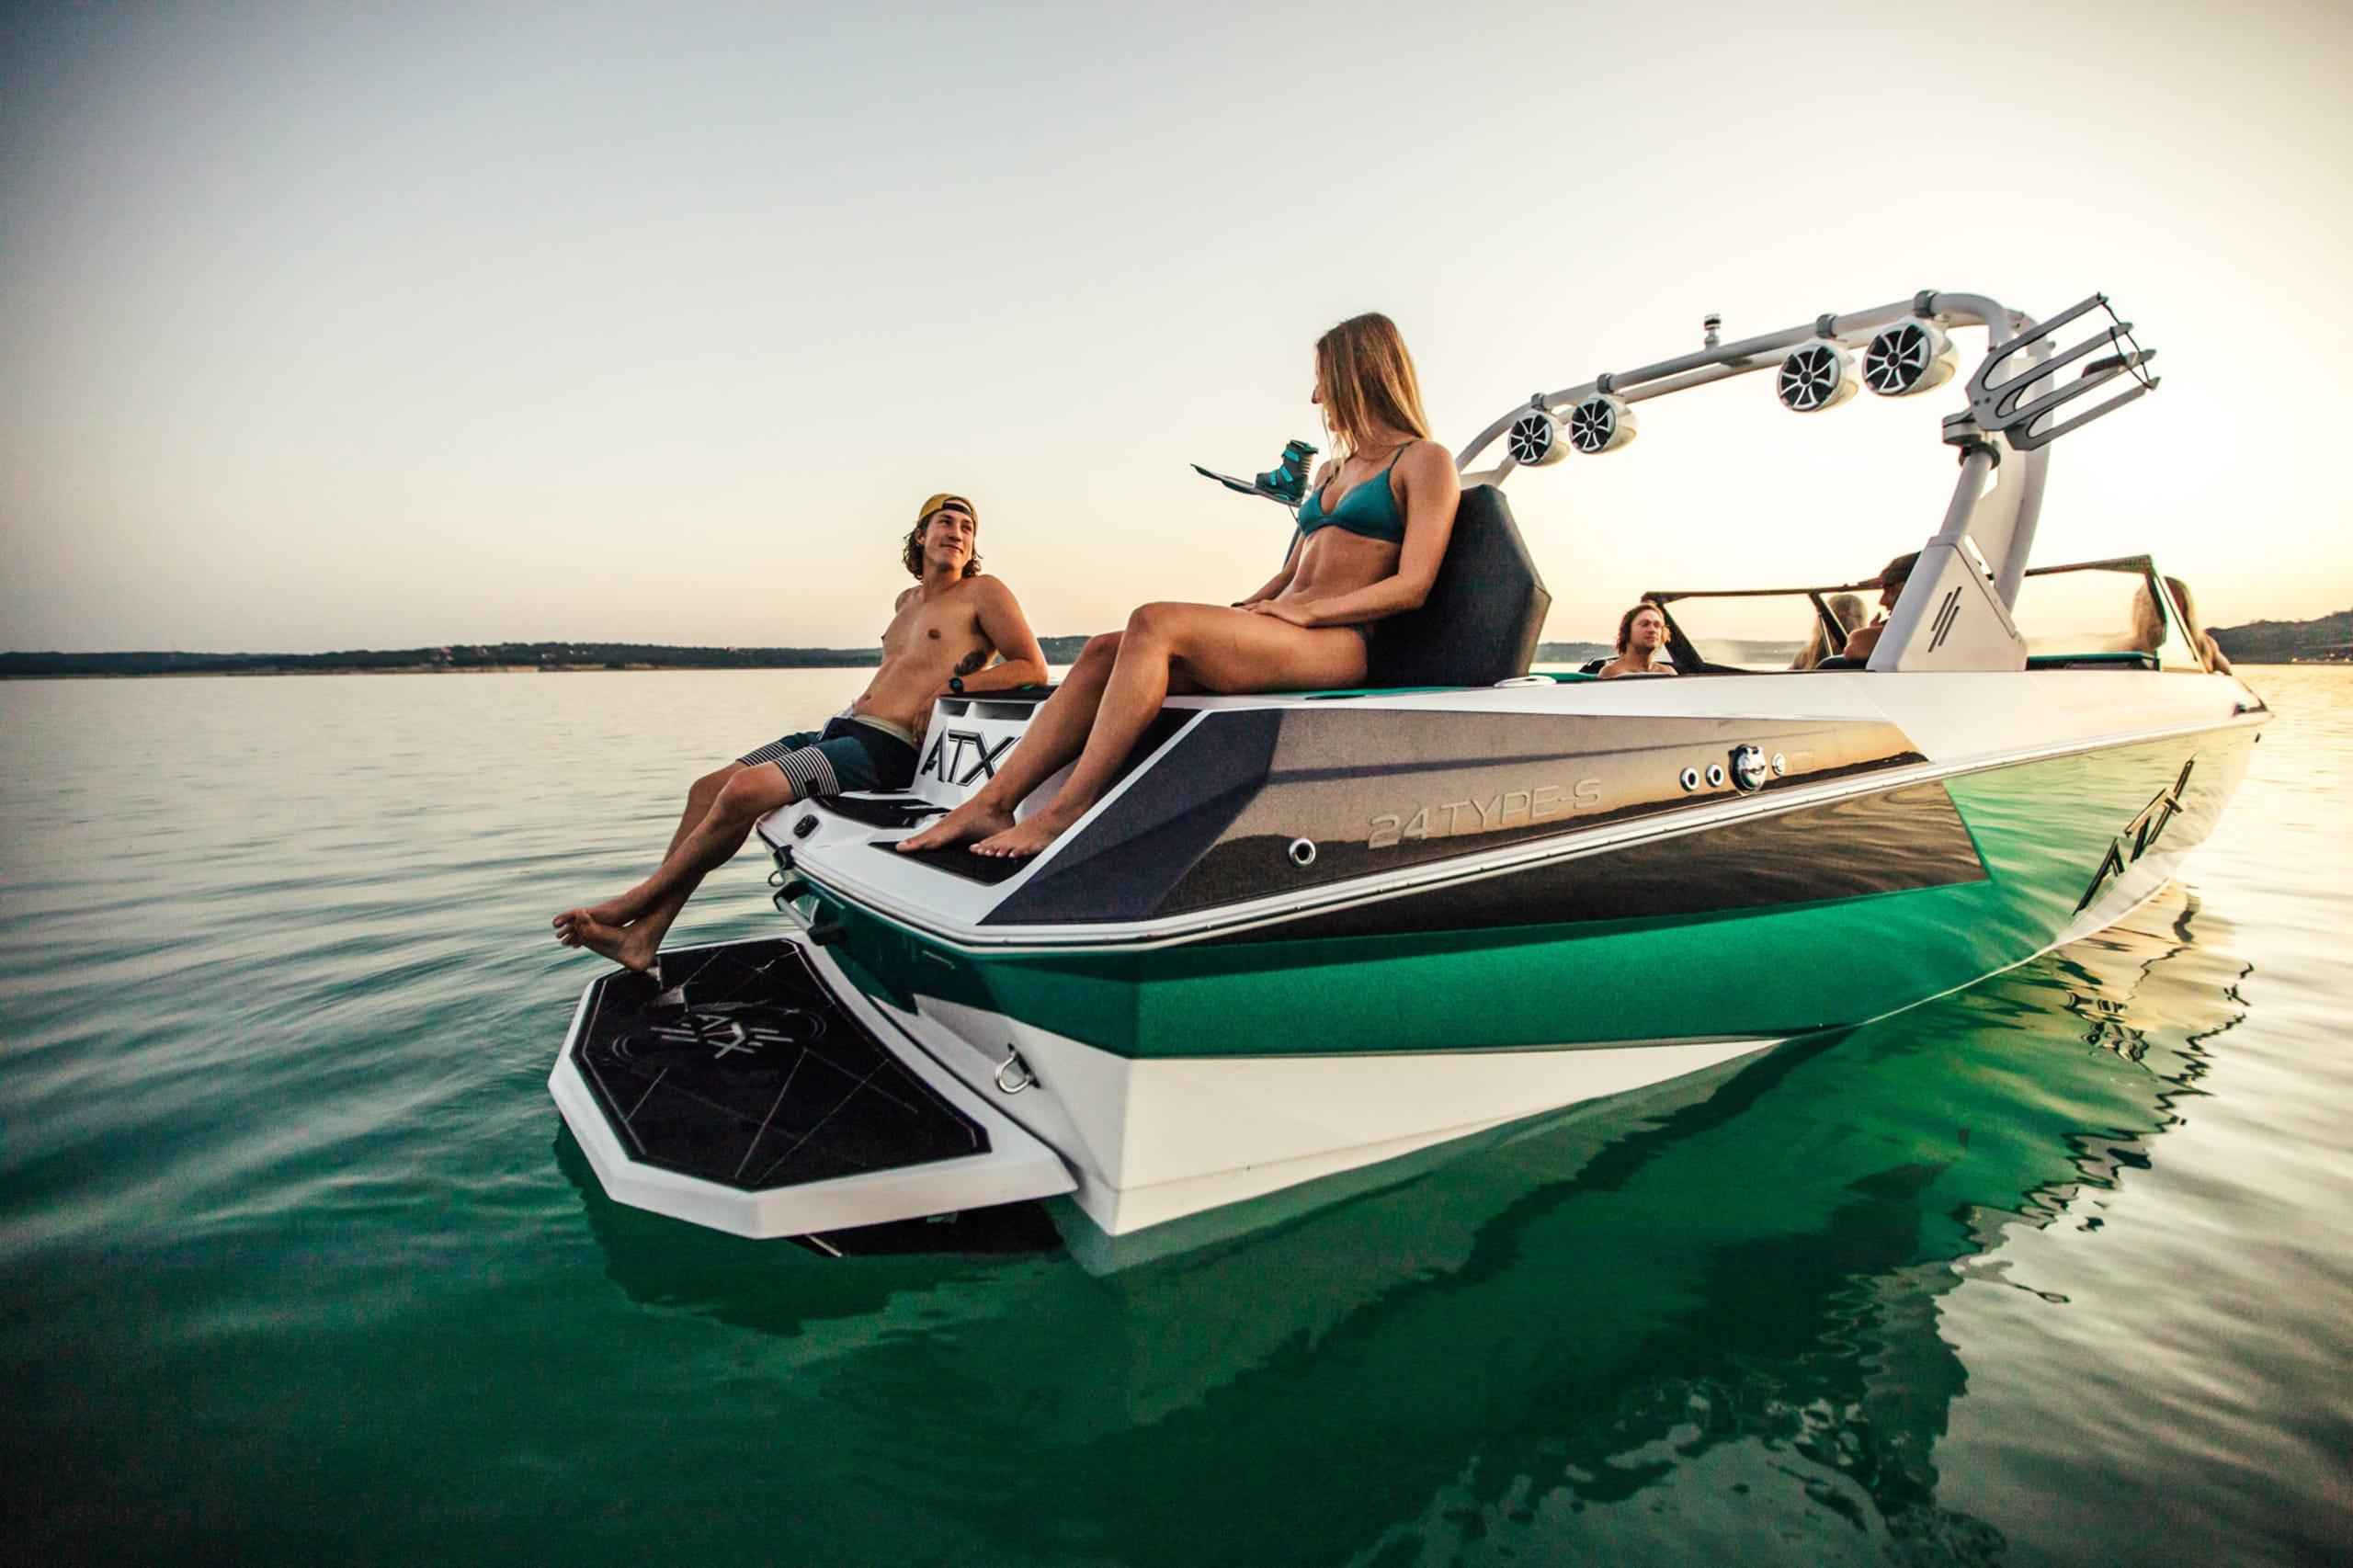 2021 ATX Boats 2021 ATX Boats24 Type S Bradlee Rutledge 5253